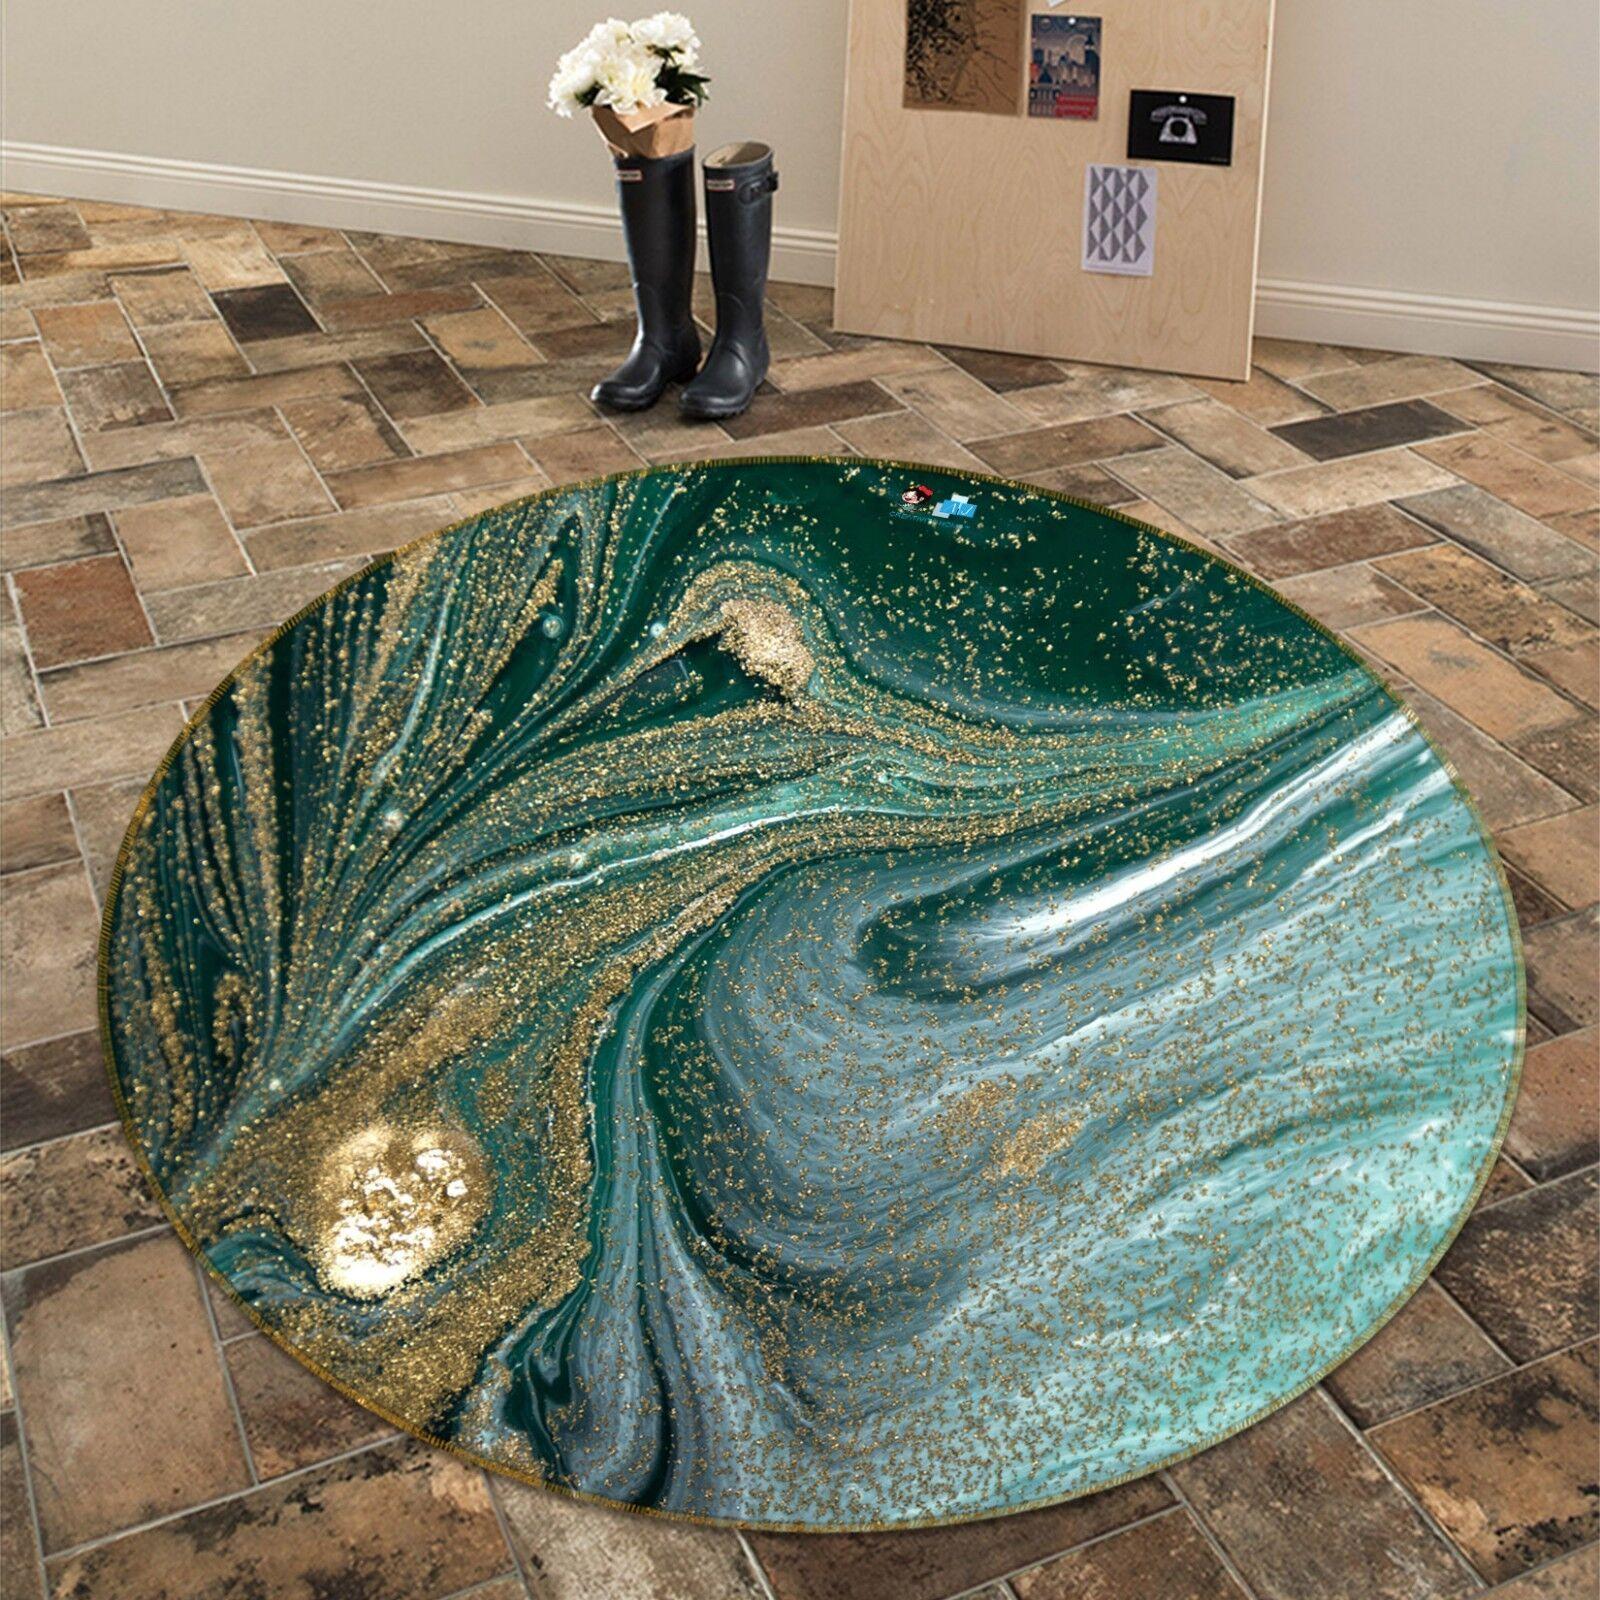 3d universo estrellas luz 5 antideslizante alfombra maletero rondas elegante alfombra